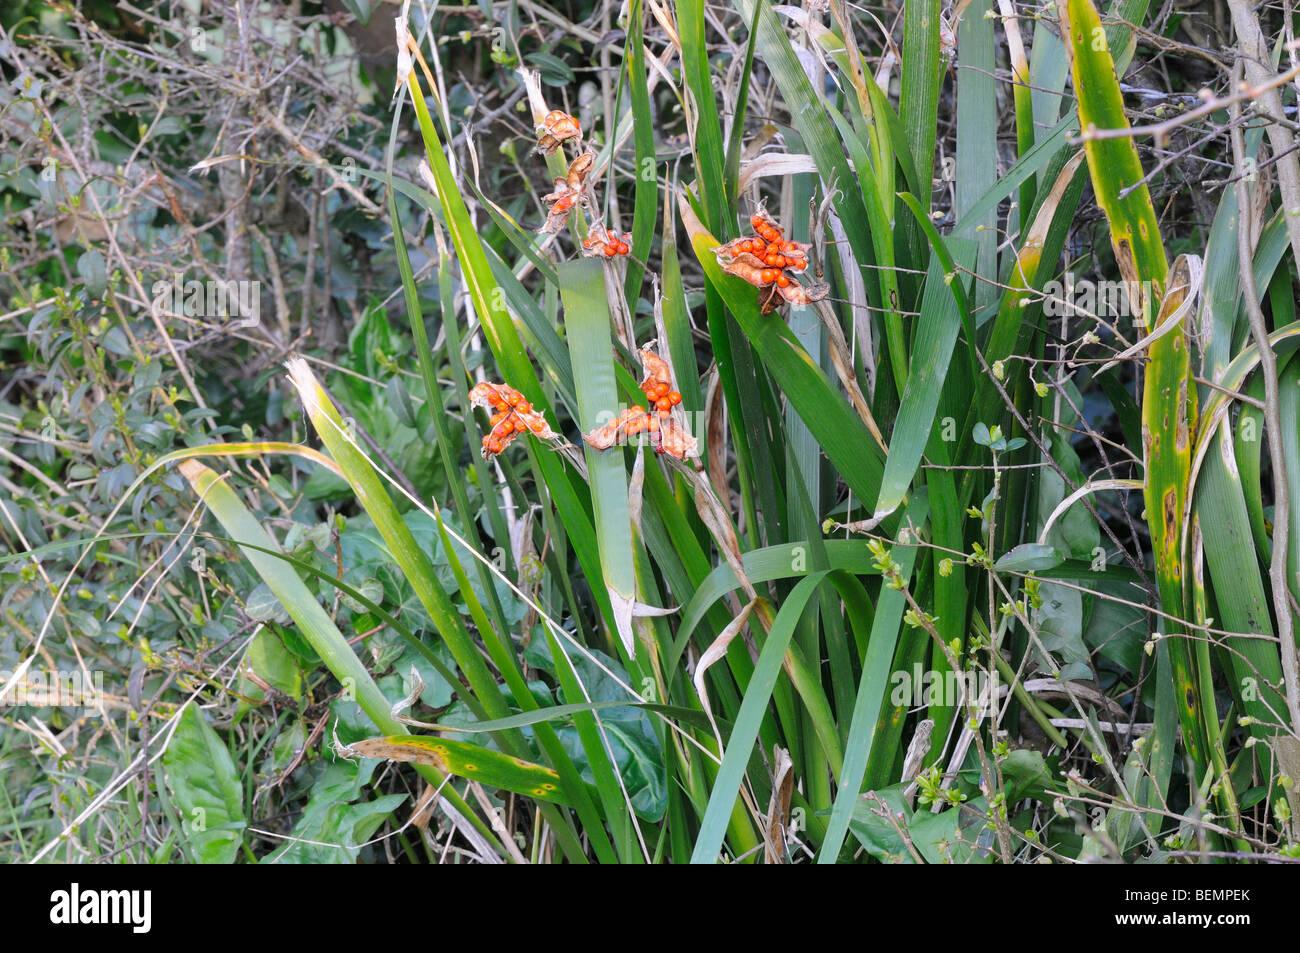 Stinking Iris Iris foetidissima Photographed in Dorset  England seed heads - Stock Image